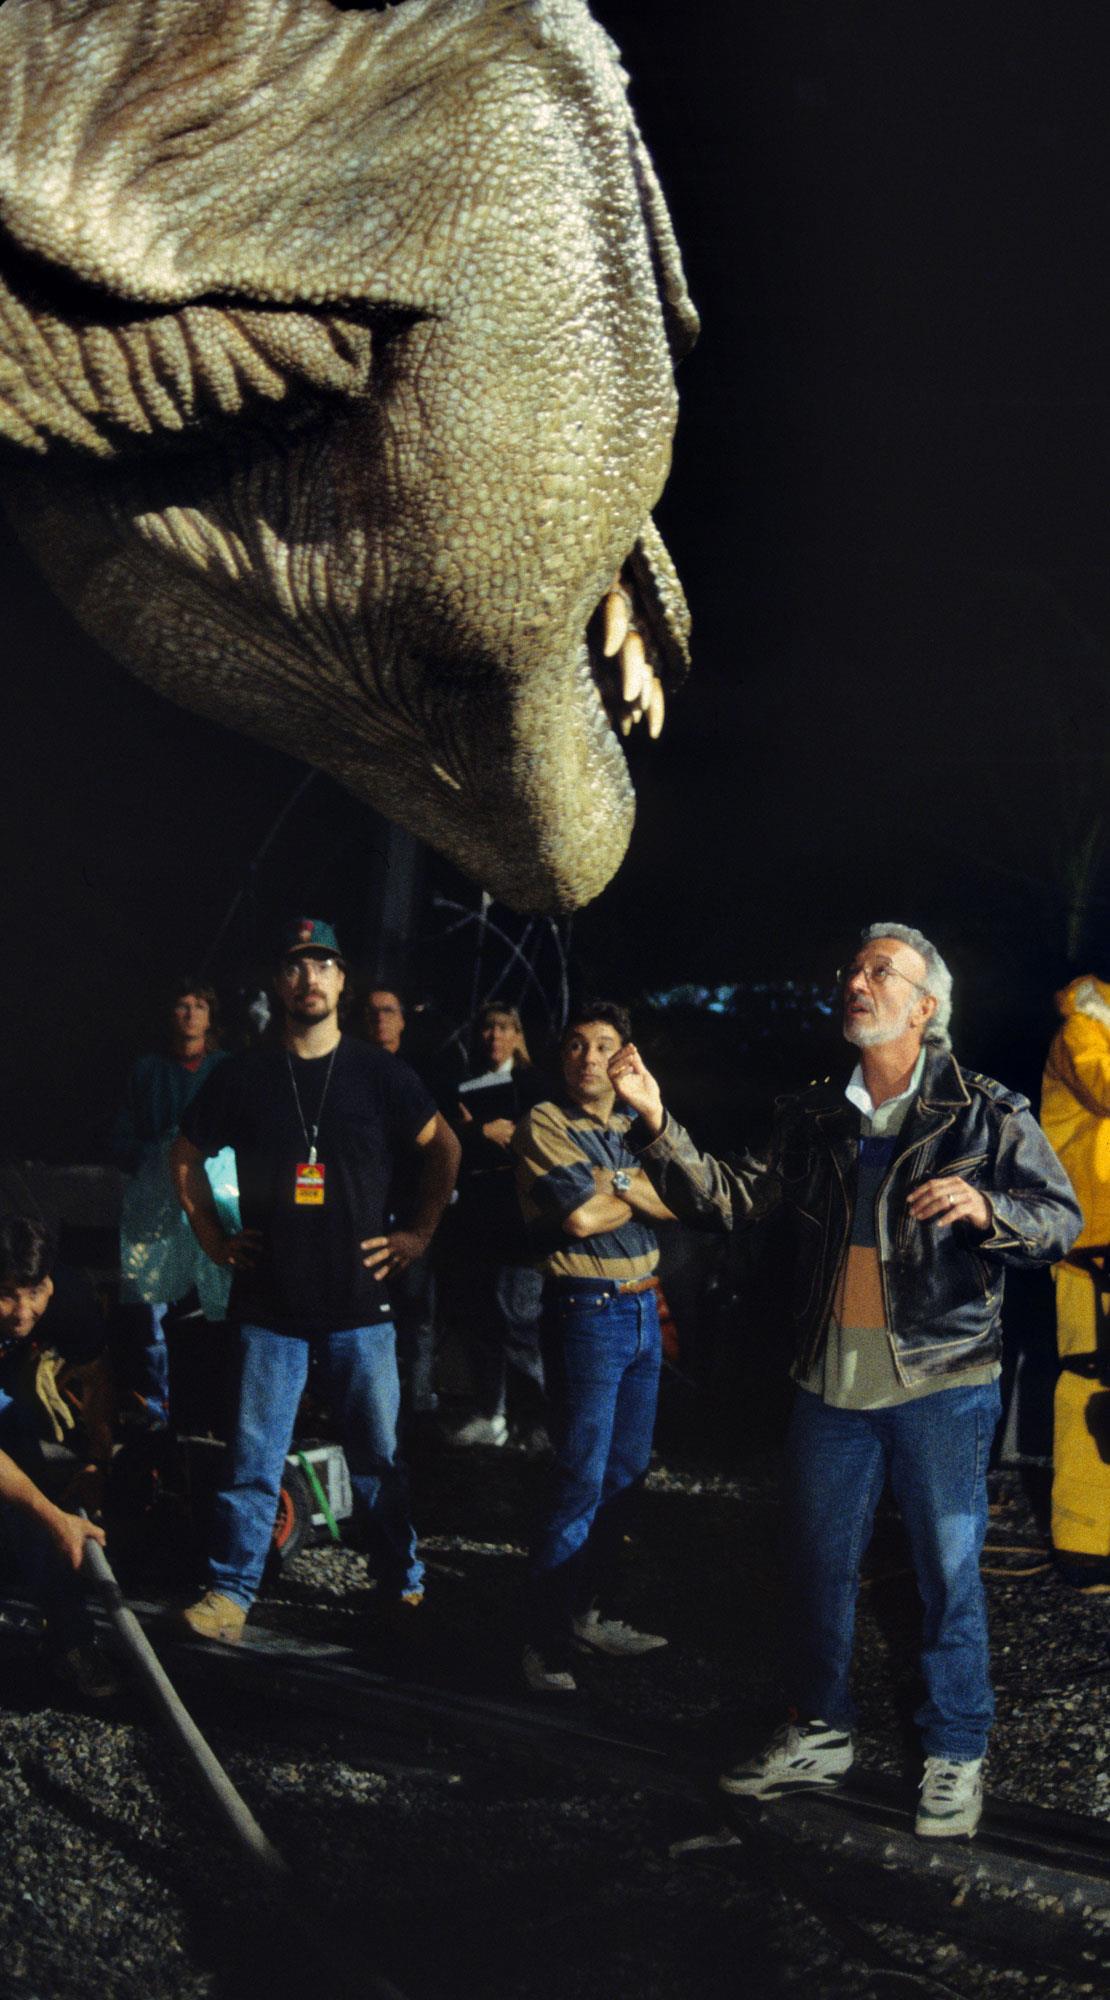 Jurassic Park BTS - Pic 1.